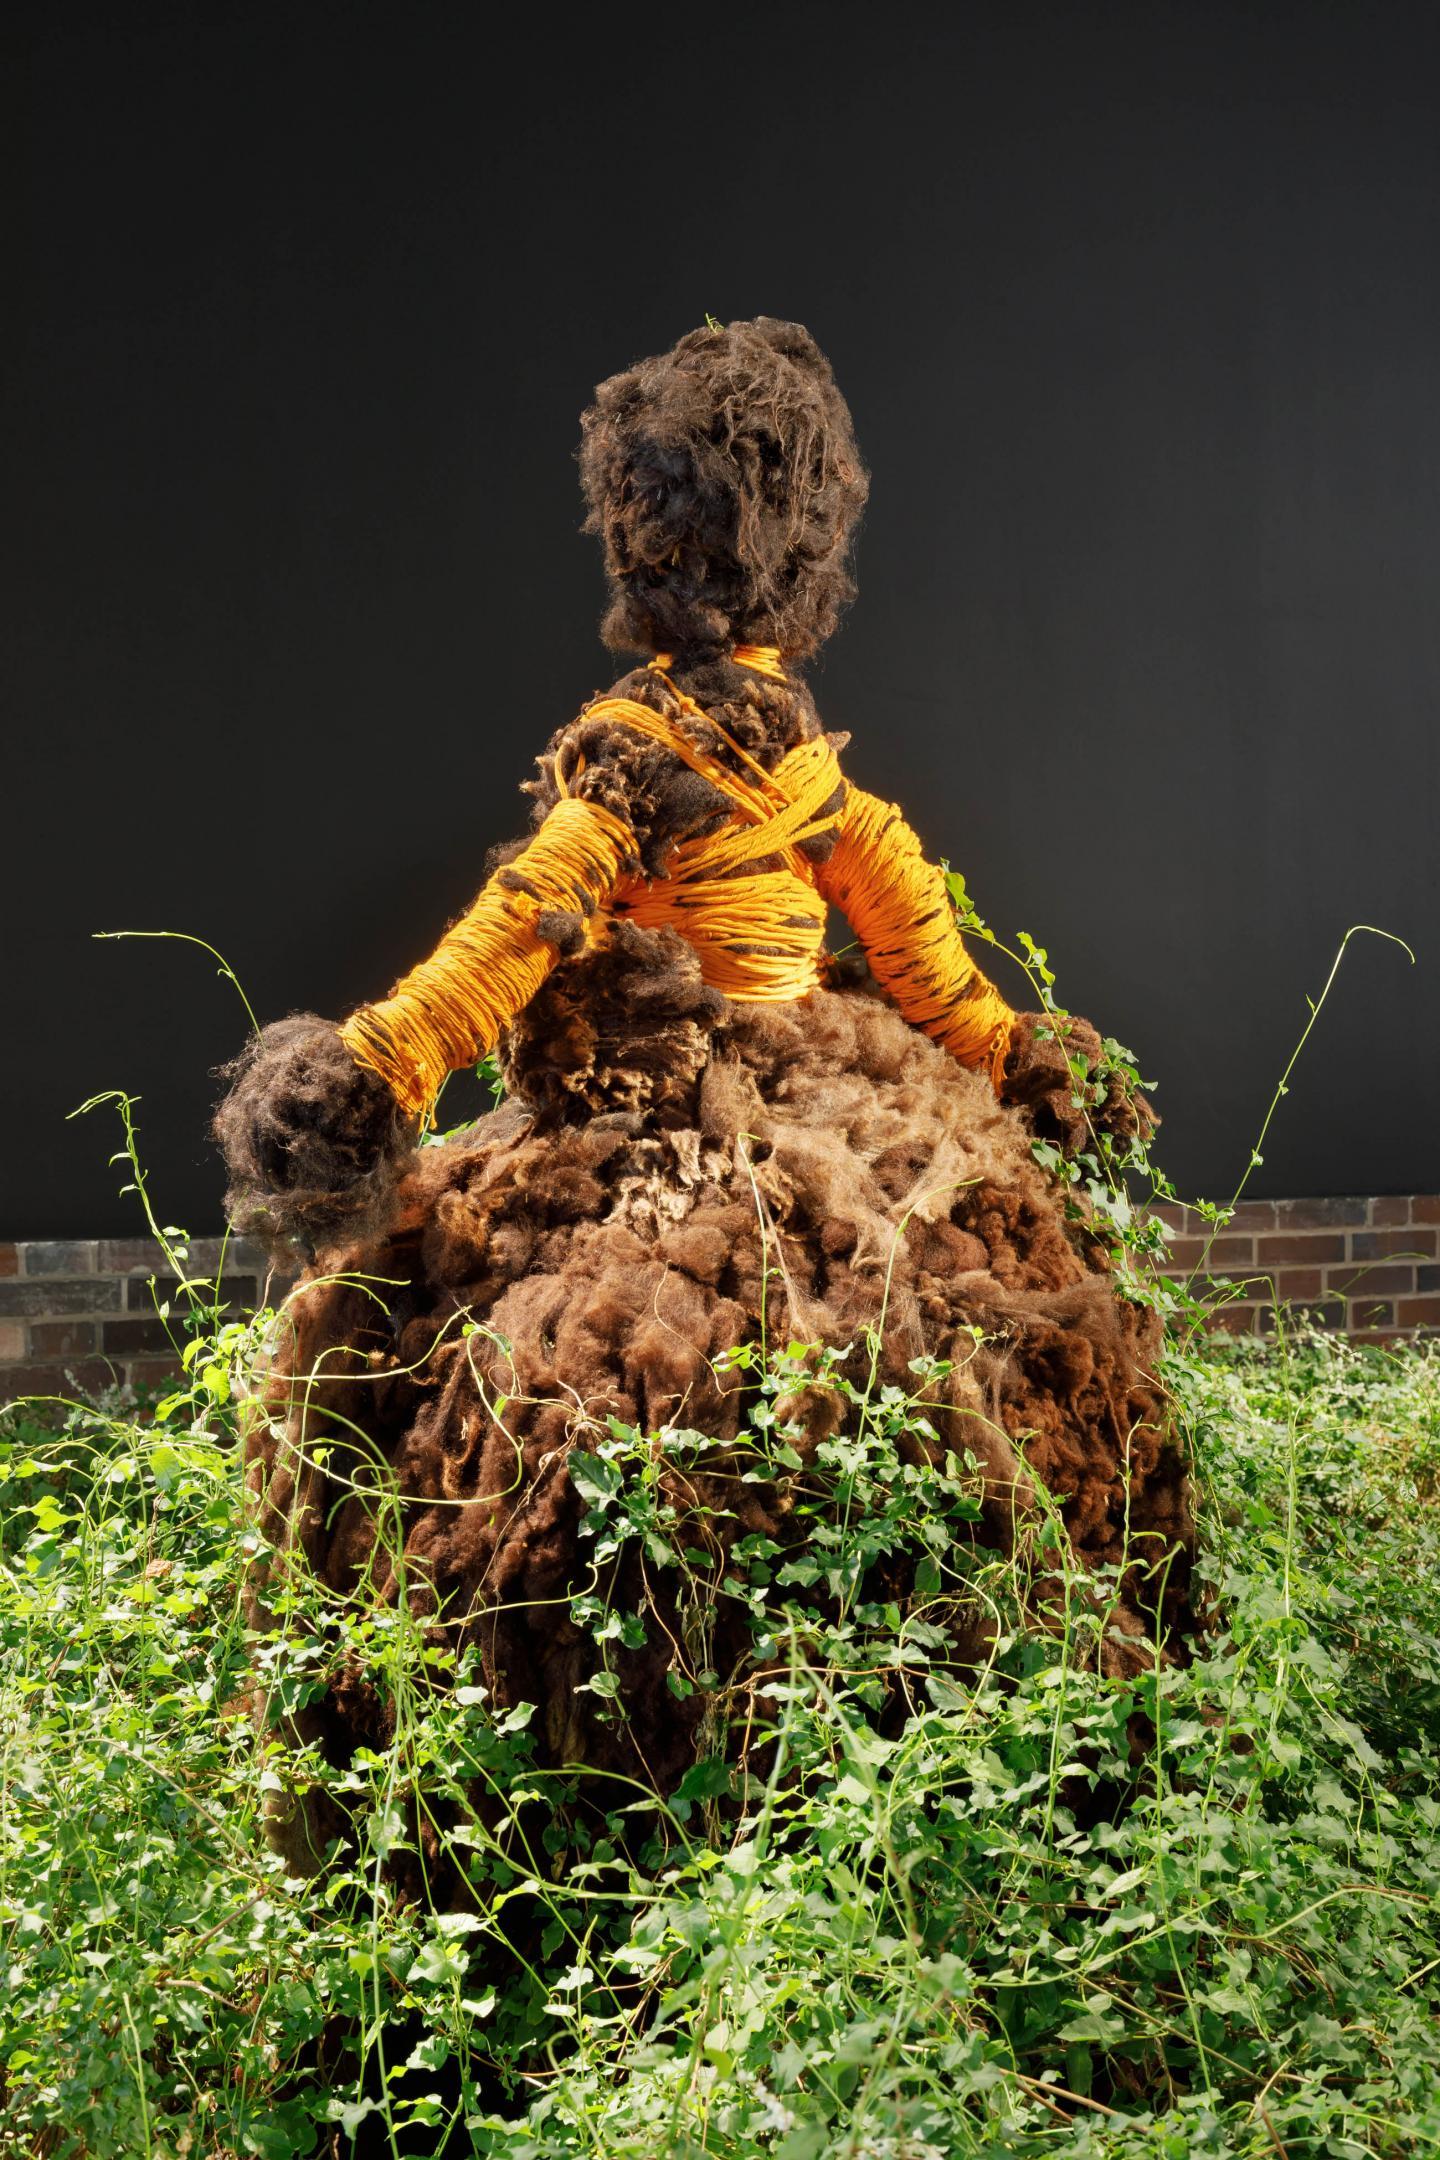 Precious Okoyomon, Earthseed, Exhibition view